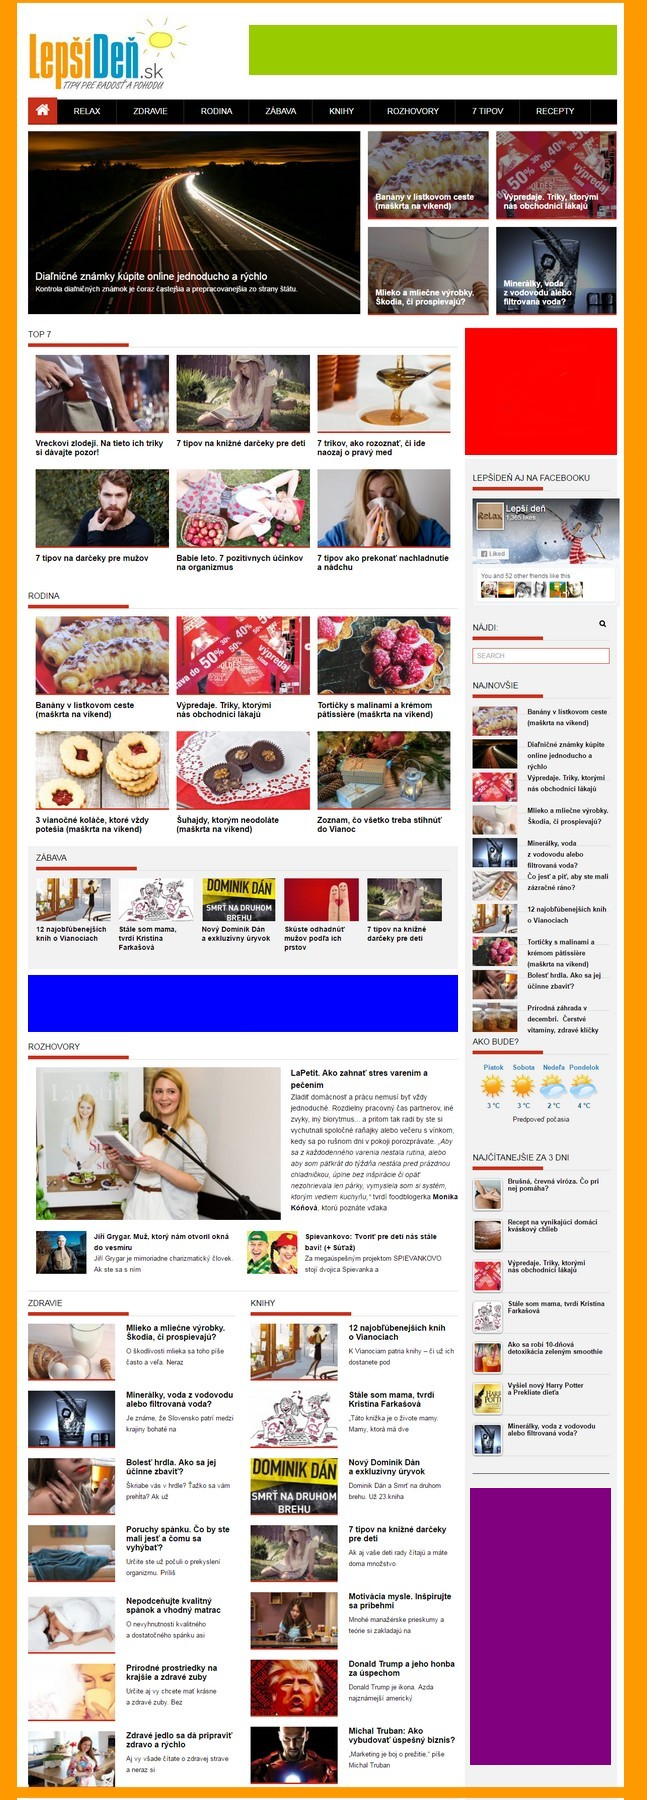 lepsiden.sk reklama cenník bannerov